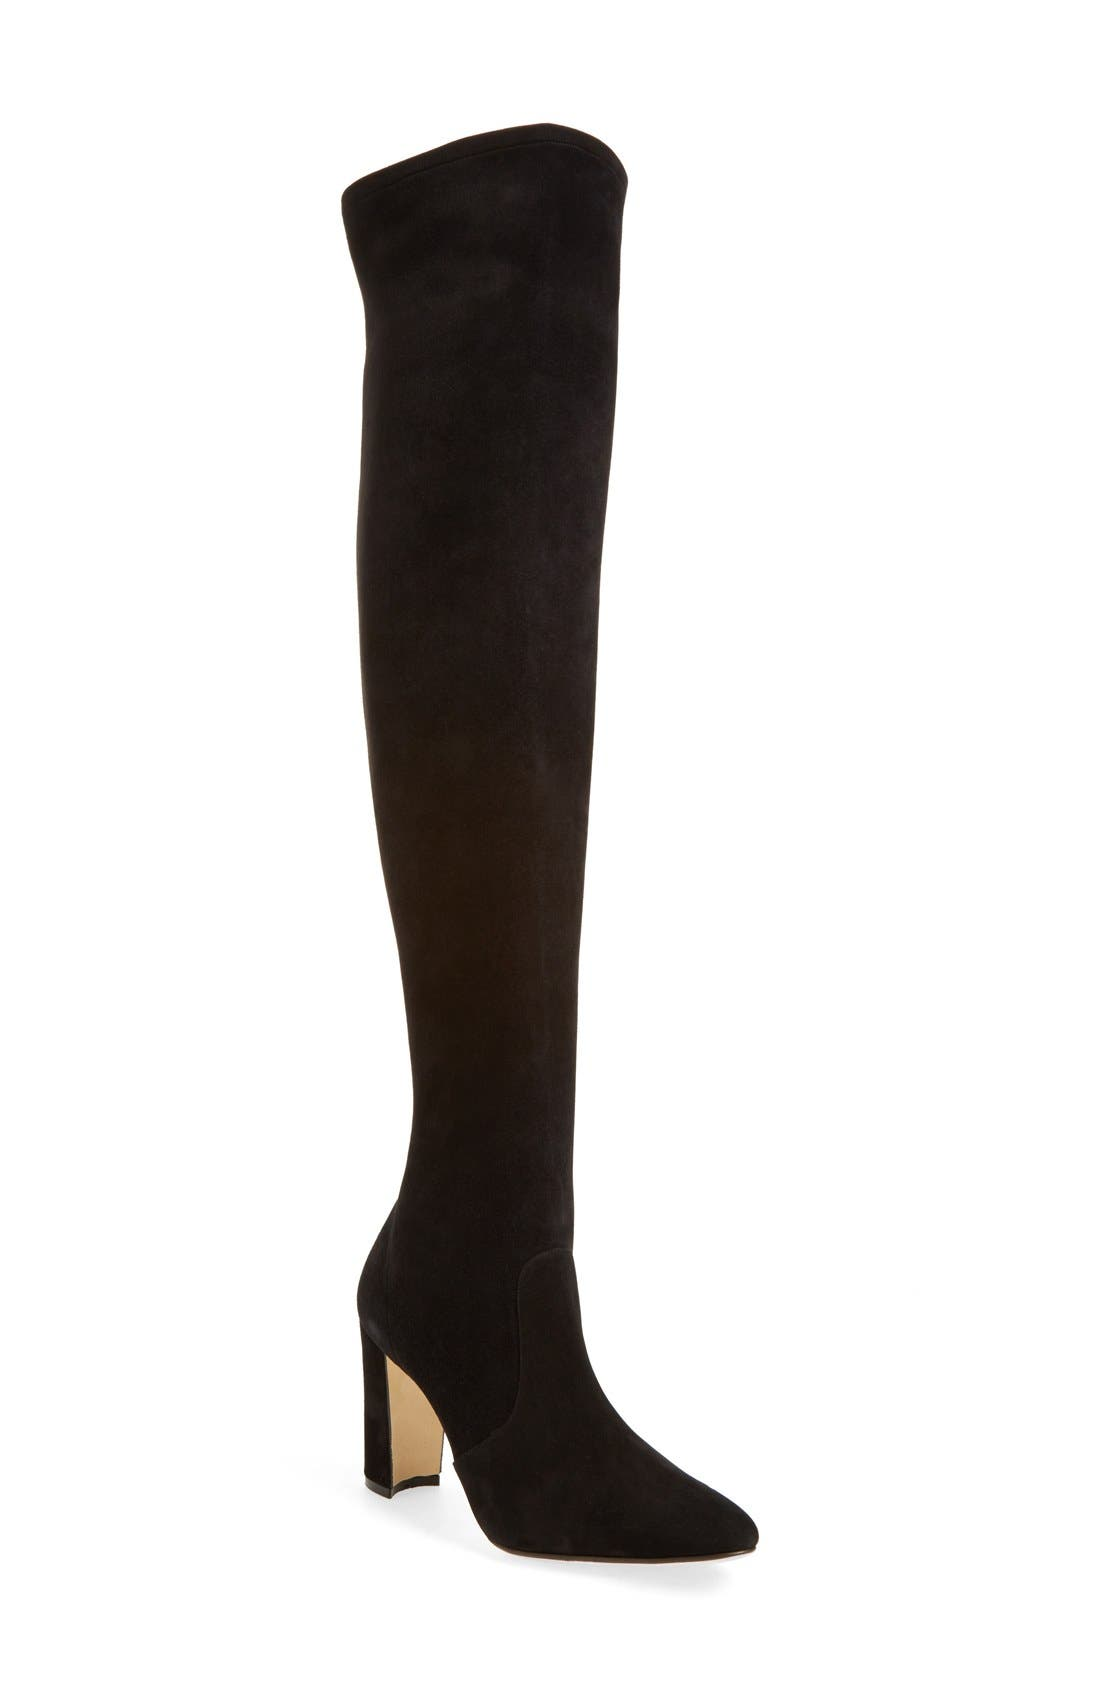 Main Image - Manolo Blahnik 'Pascalla' Over the Knee Boot (Women)